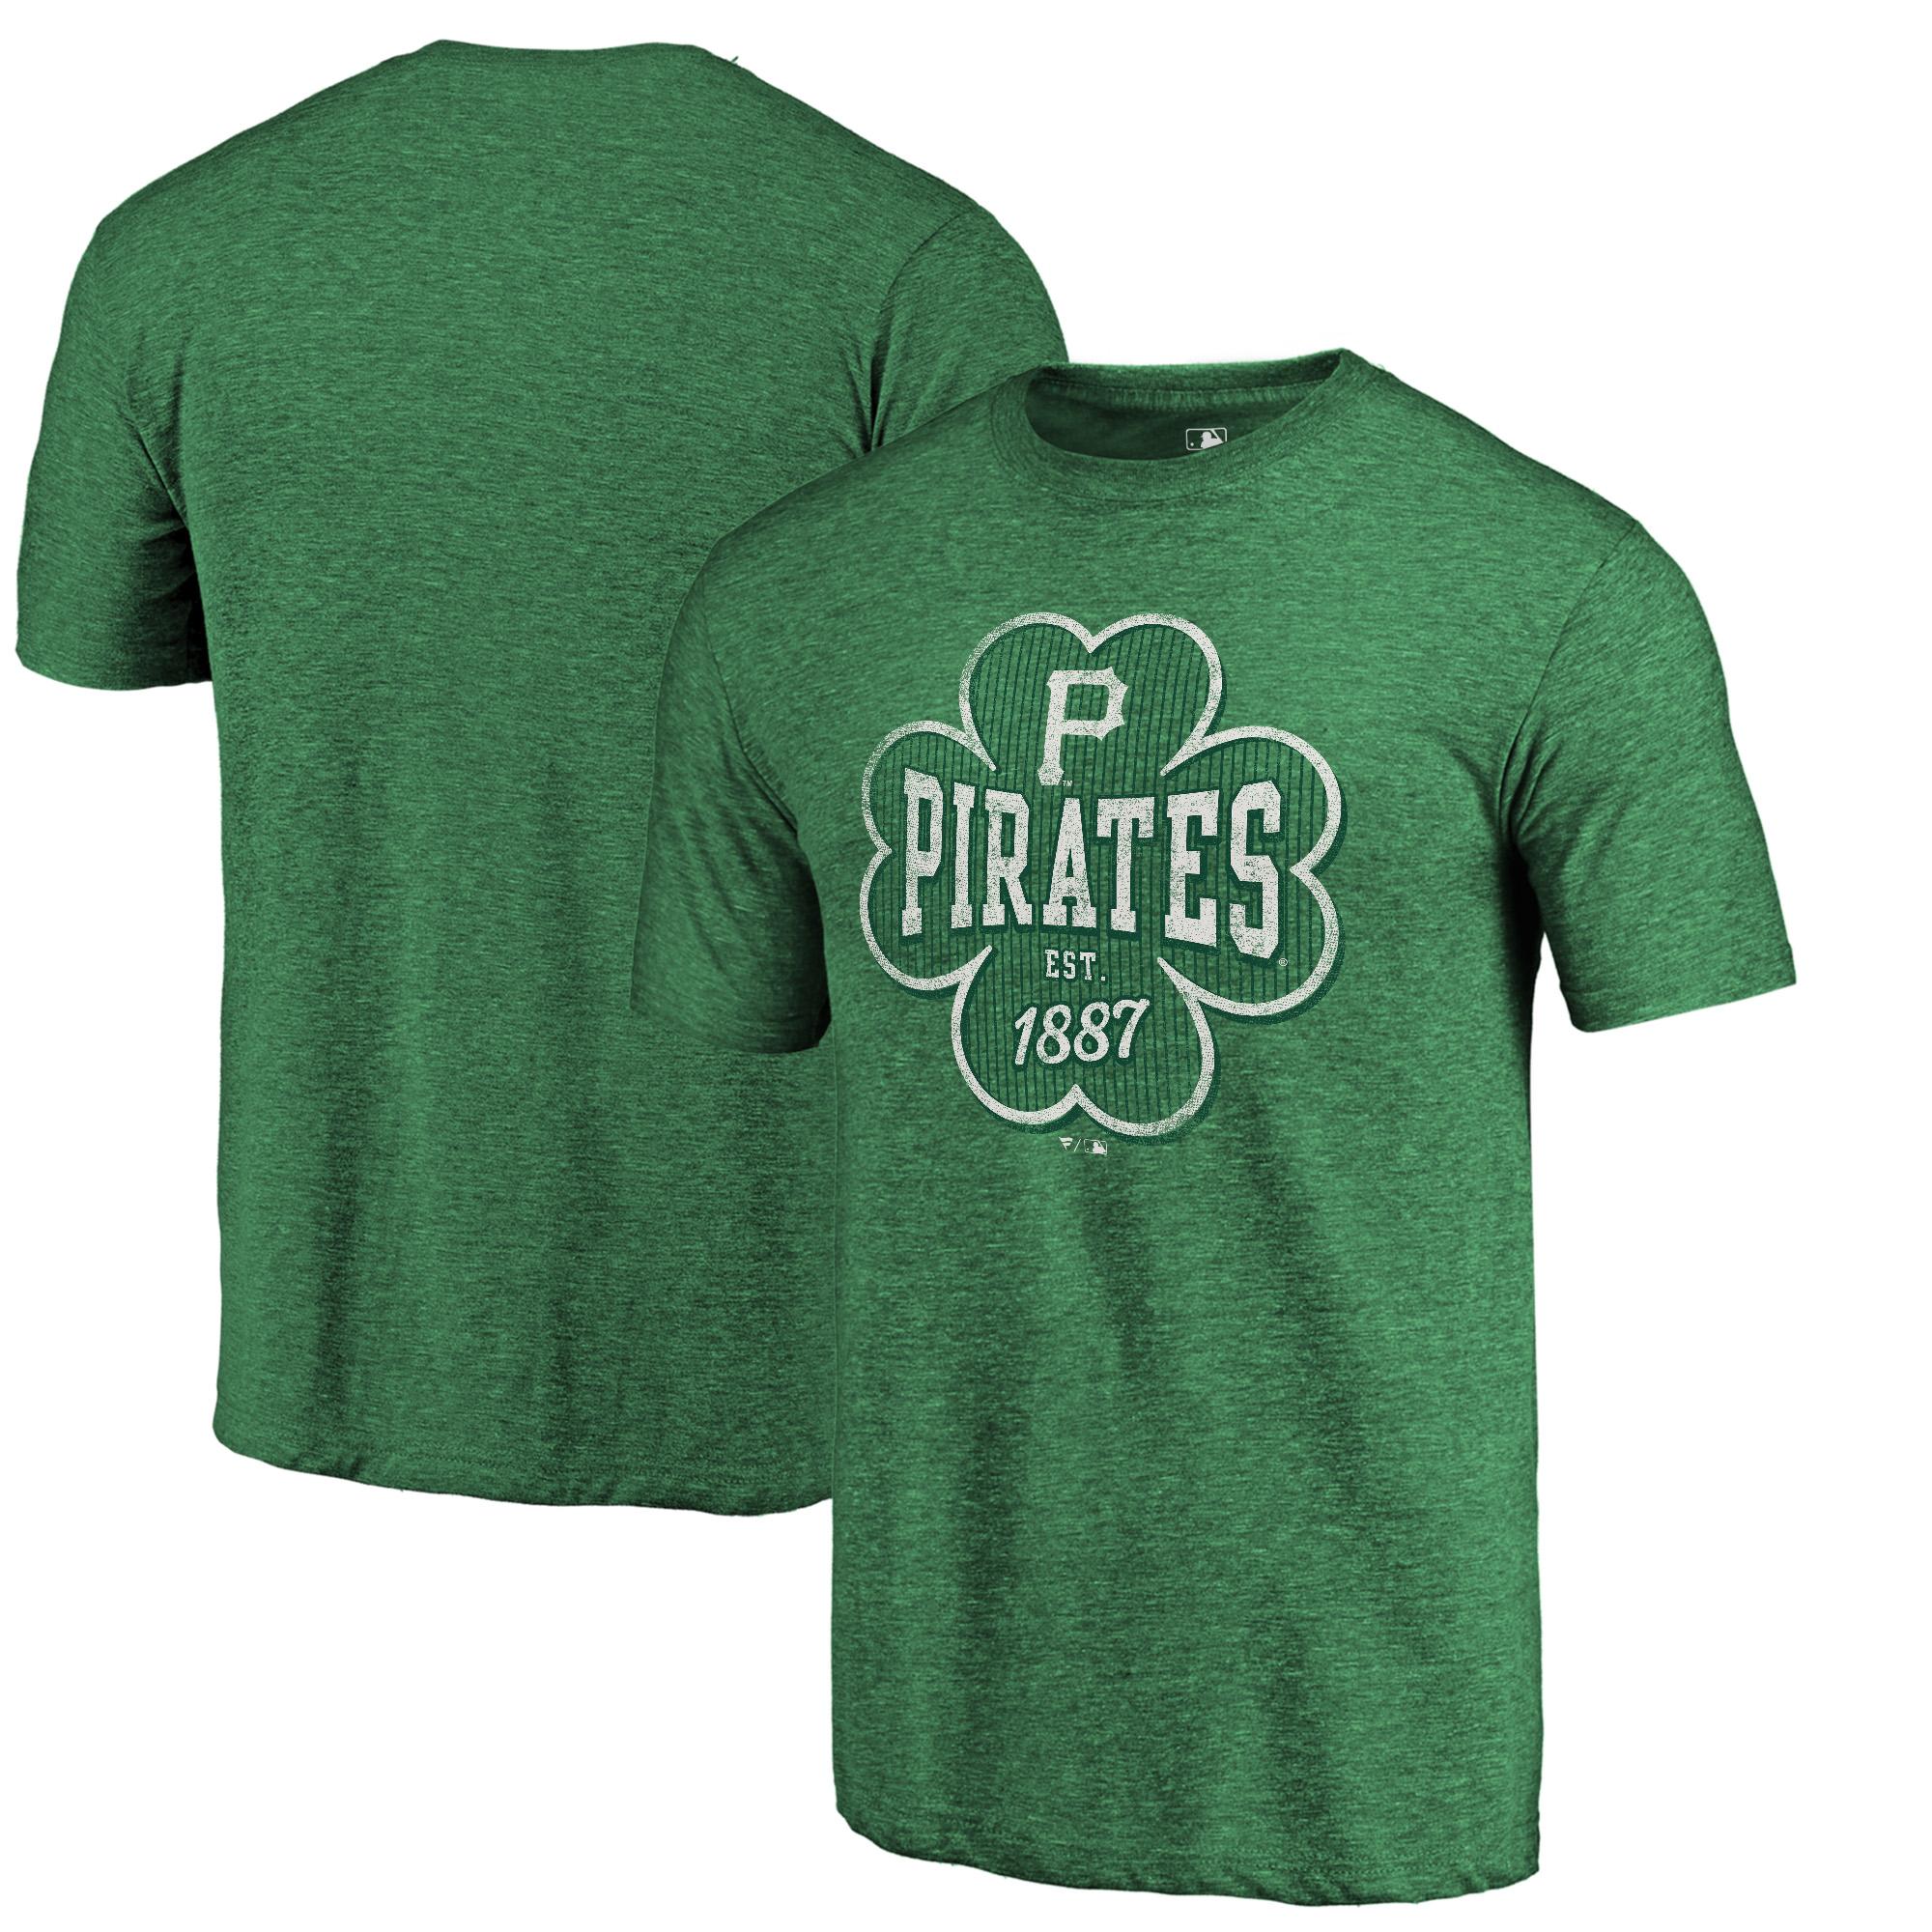 Pittsburgh Pirates Fanatics Branded 2018 St. Patrick's Day Emerald Isle Tri-Blend T-Shirt - Kelly Green